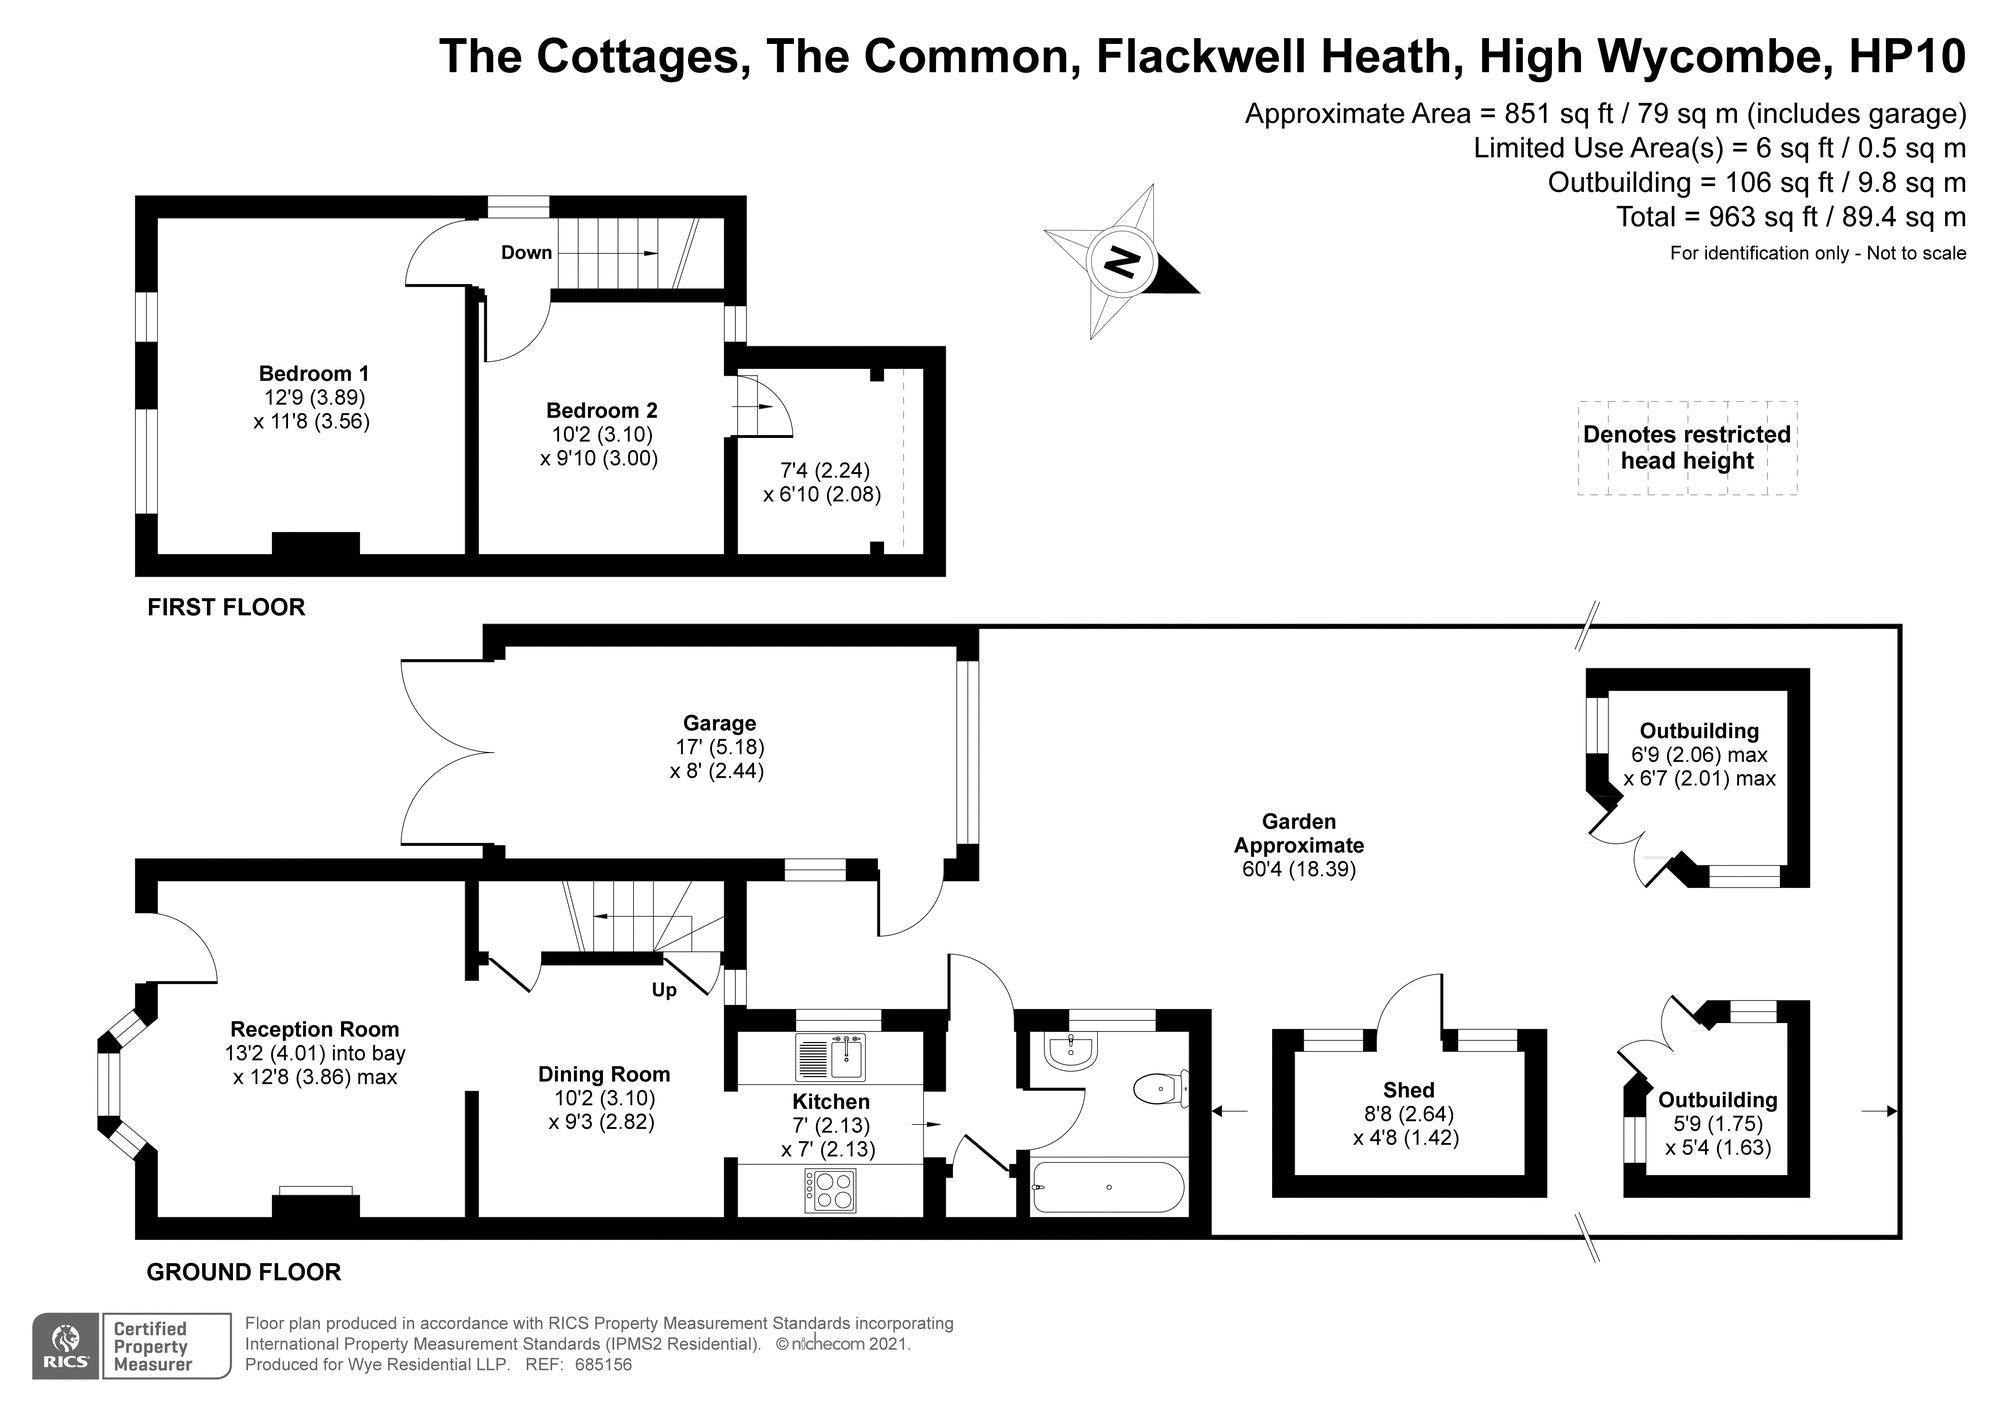 The Common Flackwell Heath